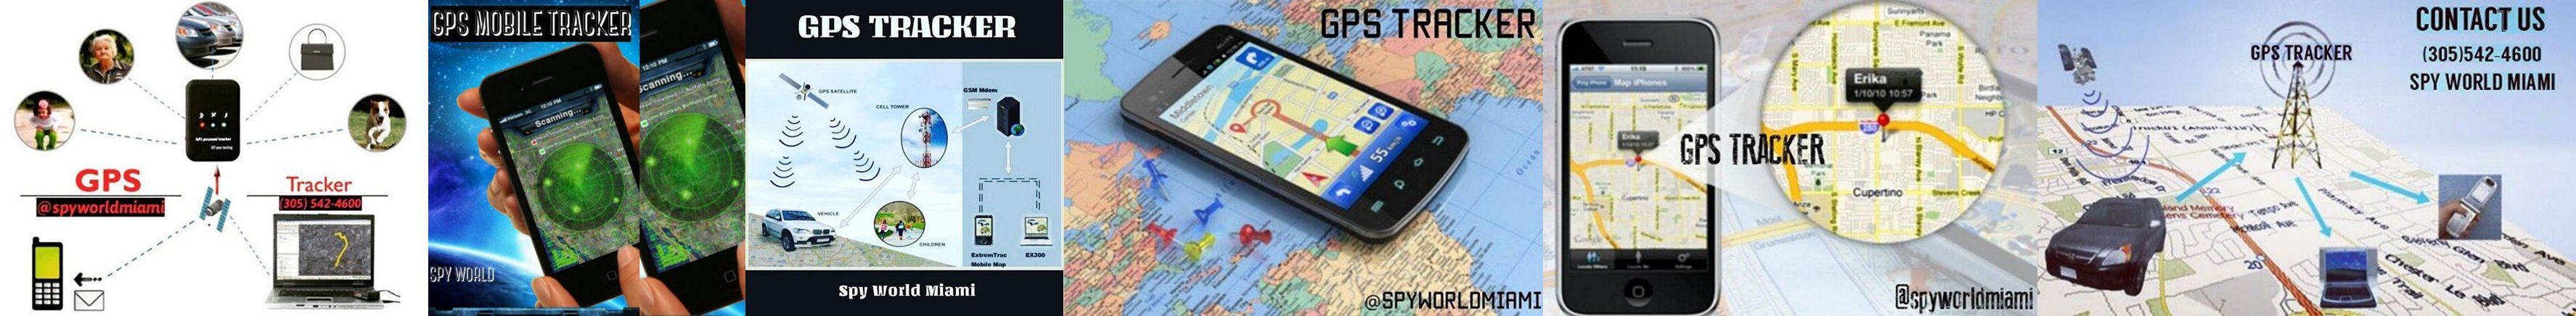 Auto GPS Miami Beach Coral Gables